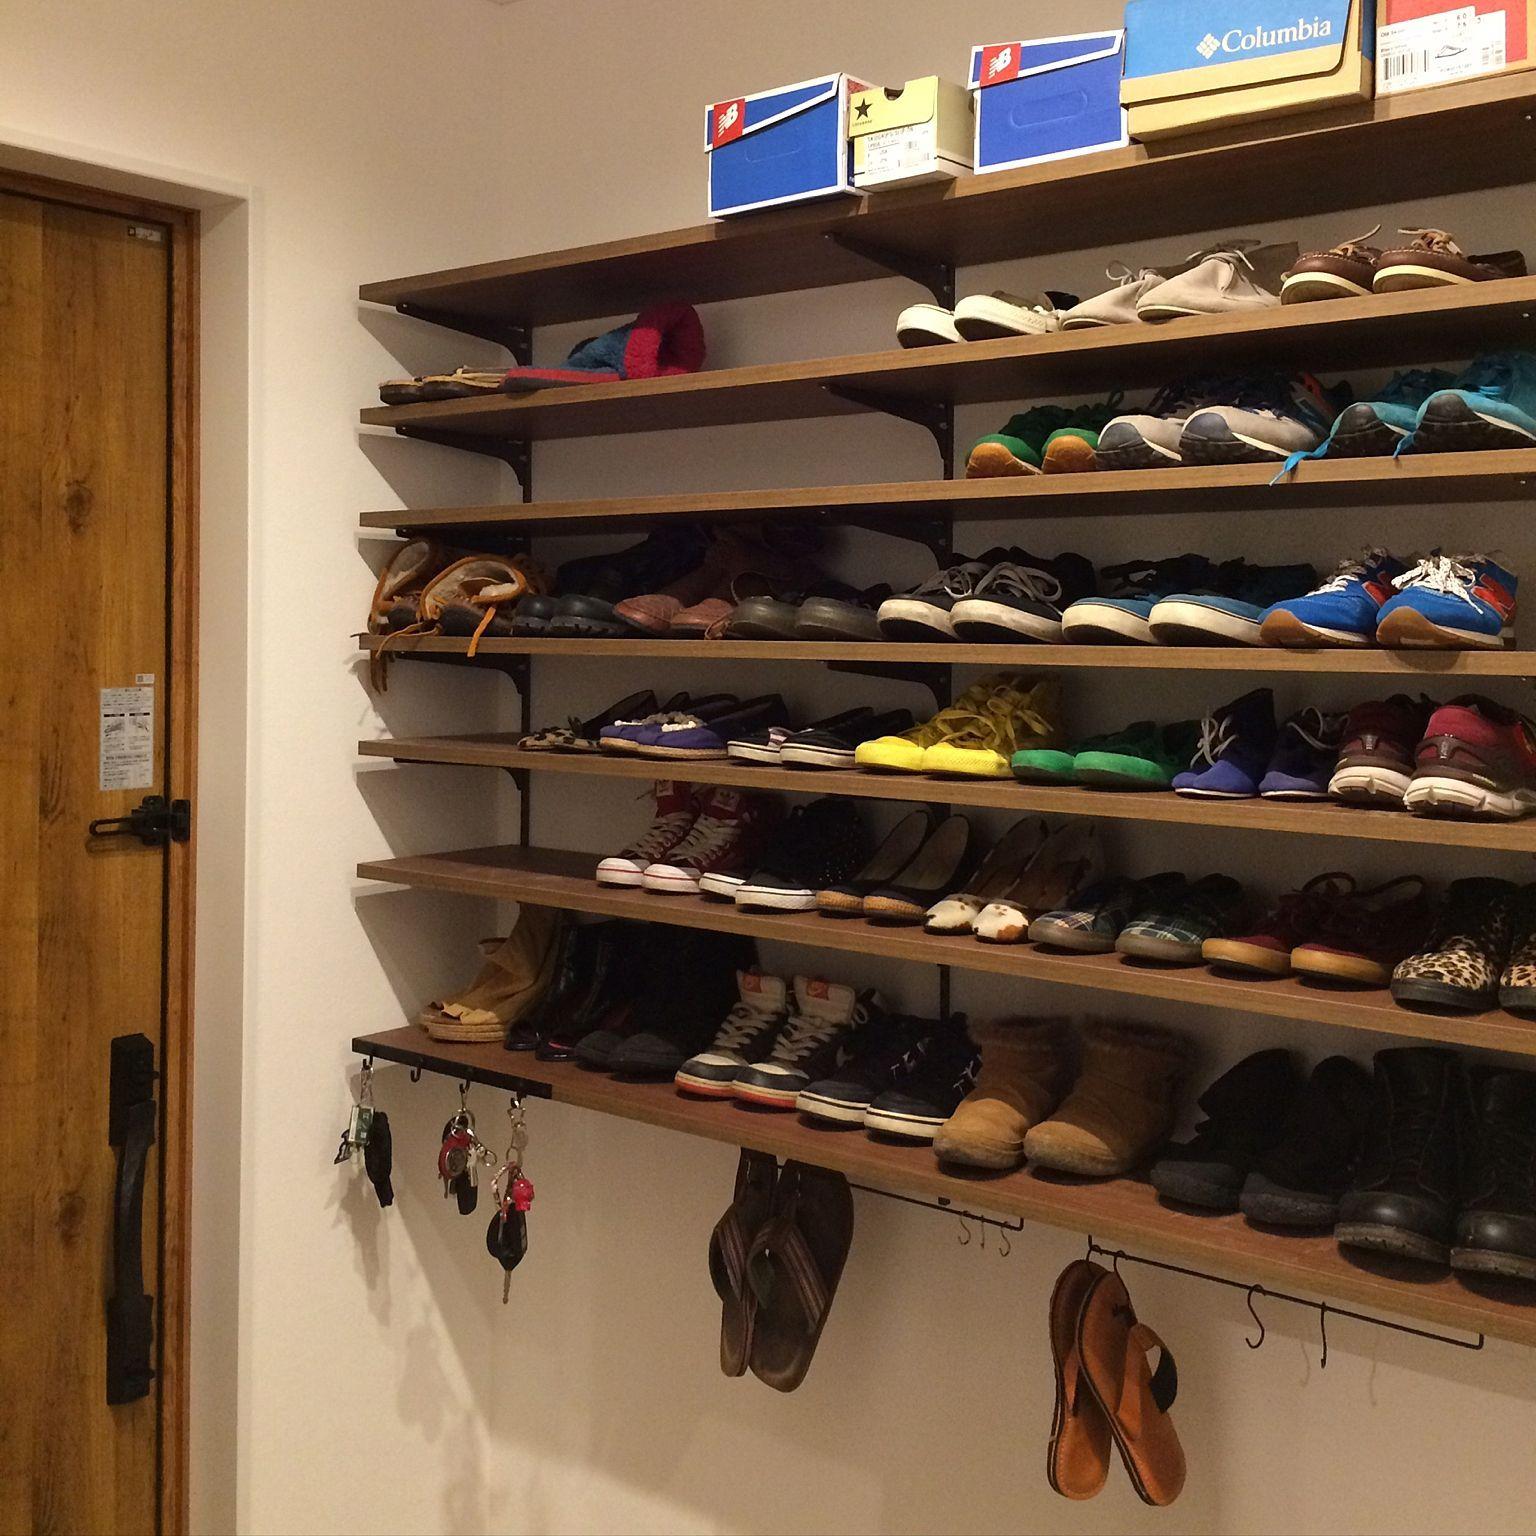 Entrance Diy セリア スニーカー 靴棚 鍵かけフックのインテリア実例